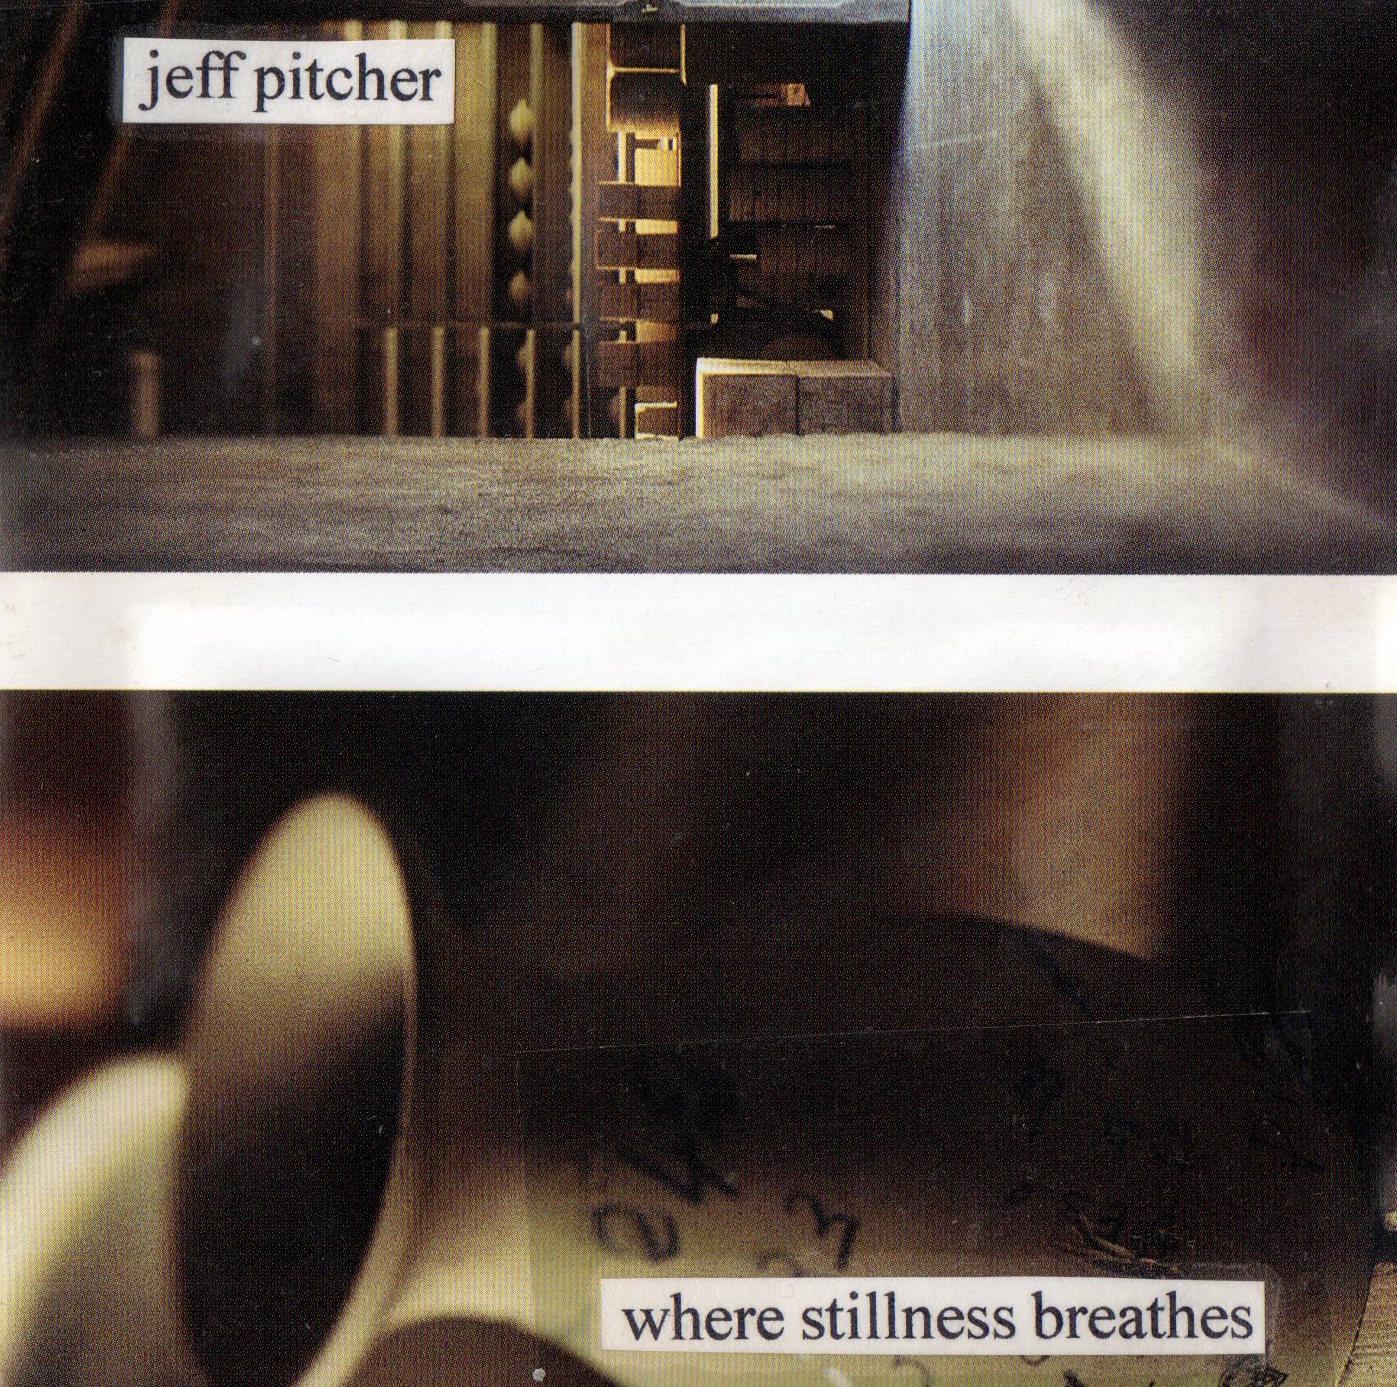 Where Stillness Breathes